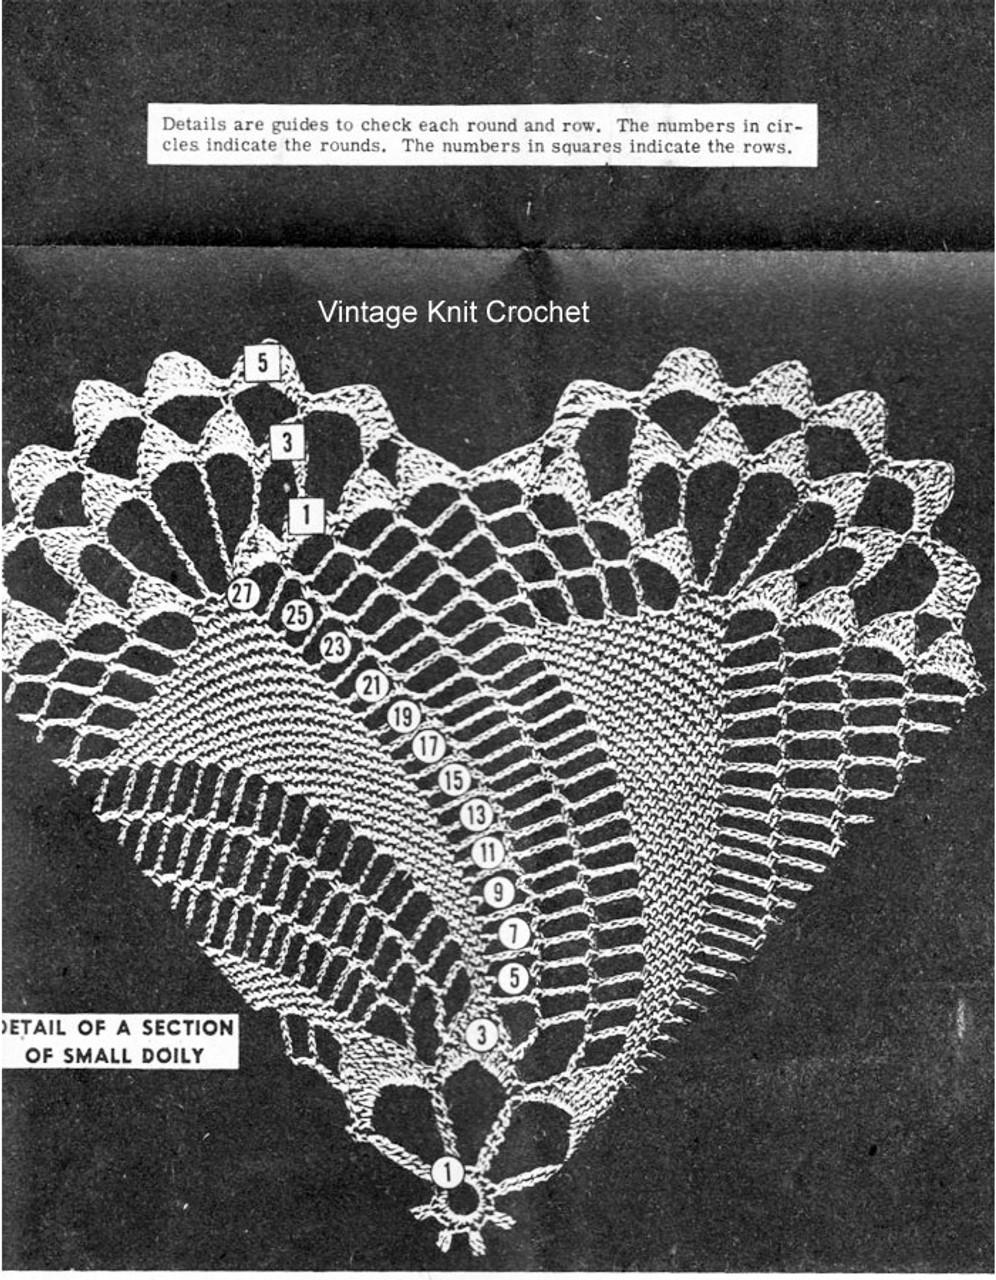 small pinwheel doily illustration design 7497